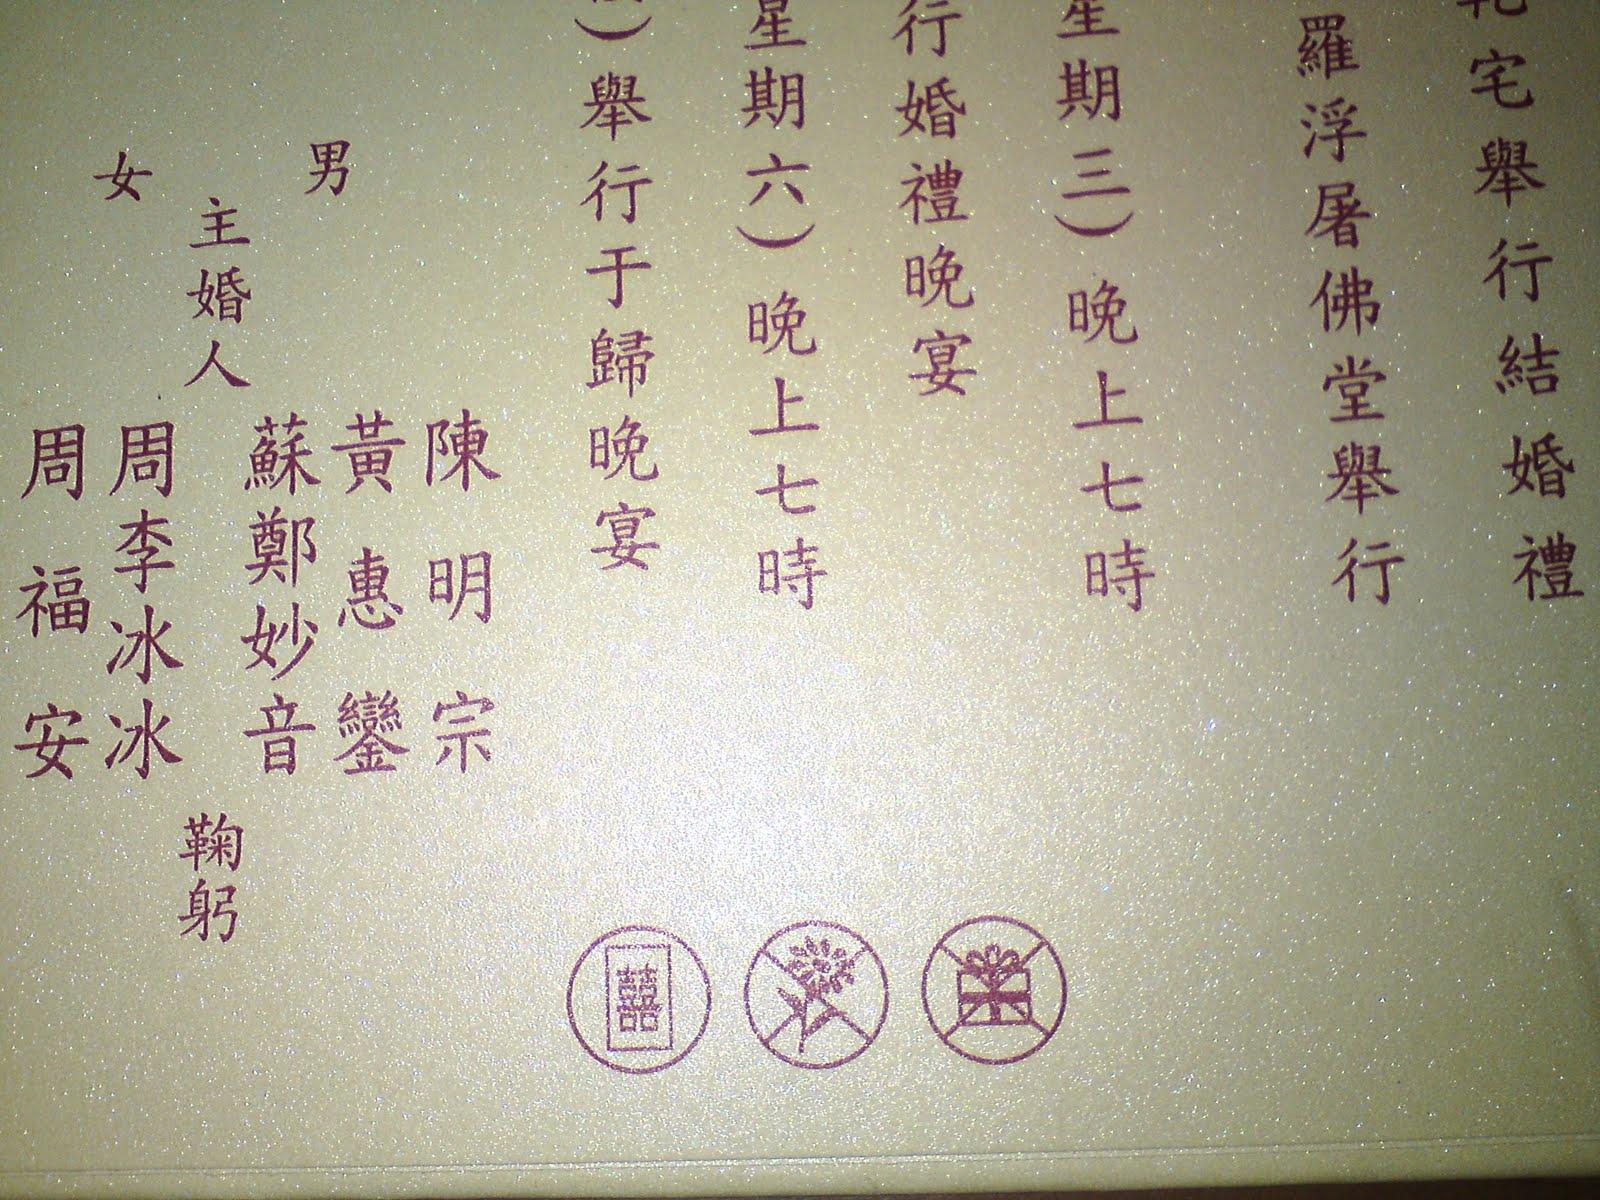 li TinGs aLoN3 wedding reception invitation card